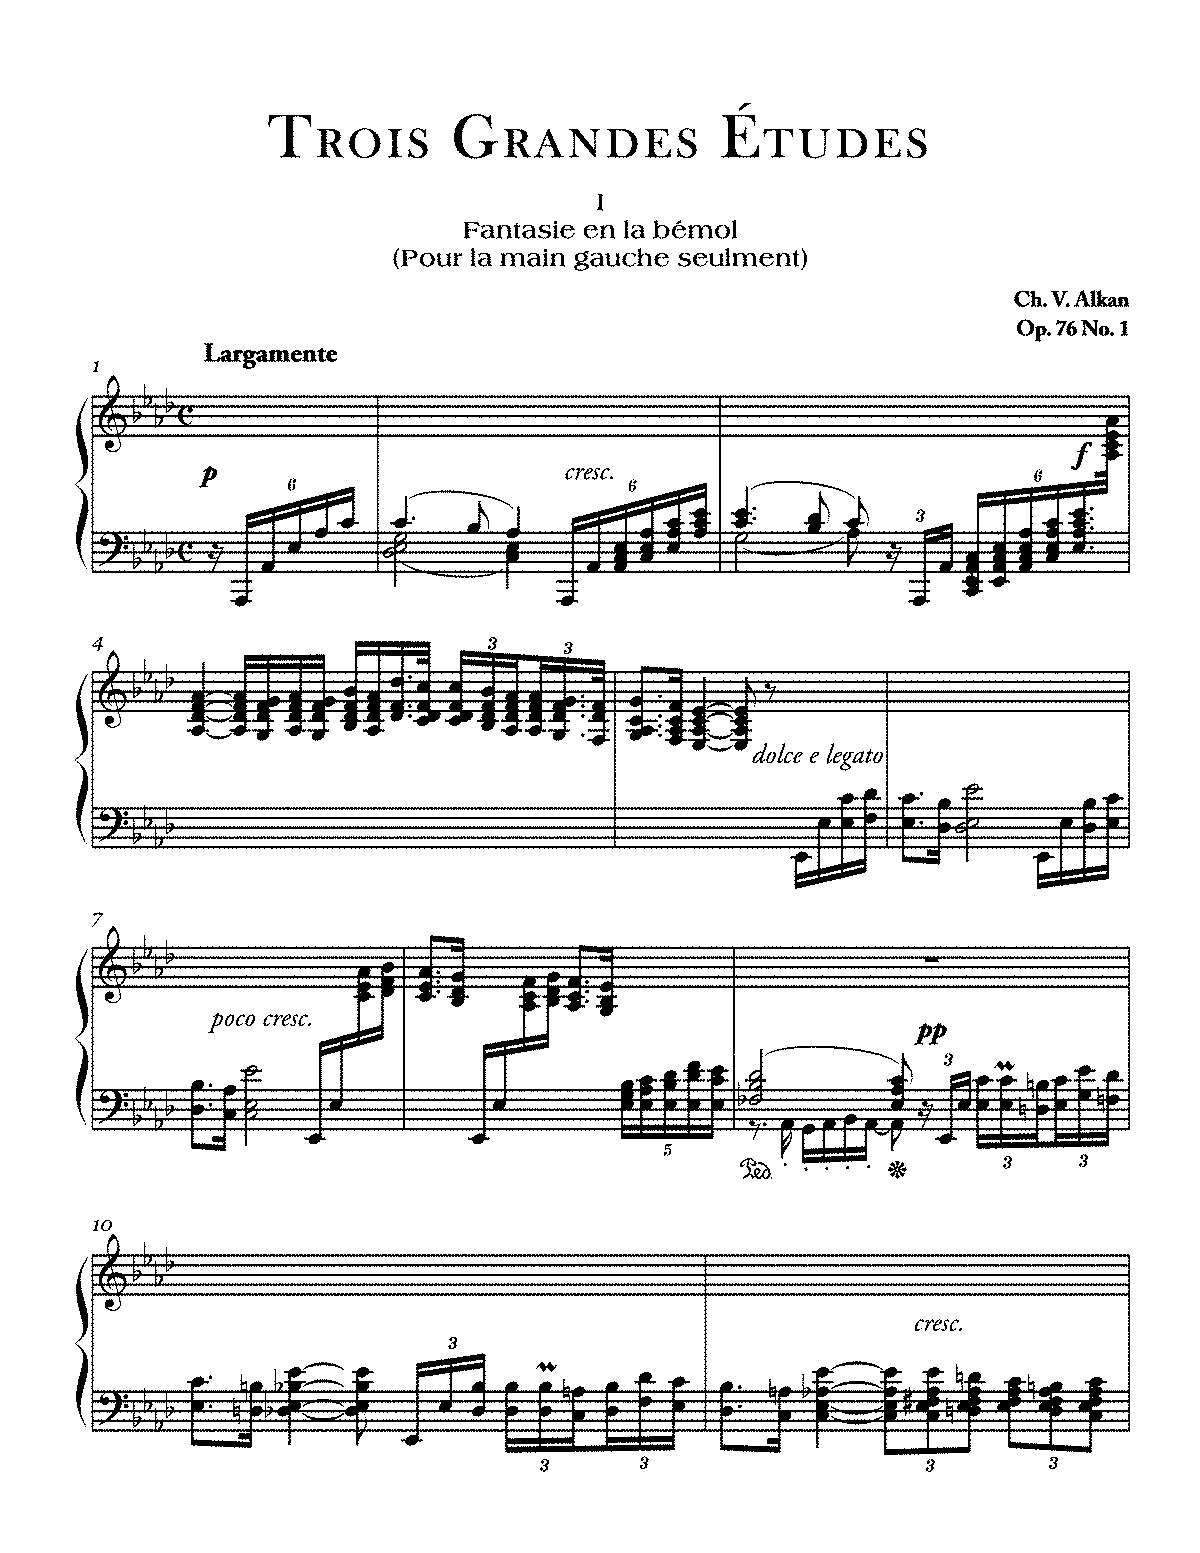 3 Grandes Tudes Op76 Alkan Charles Valentin IMSLP